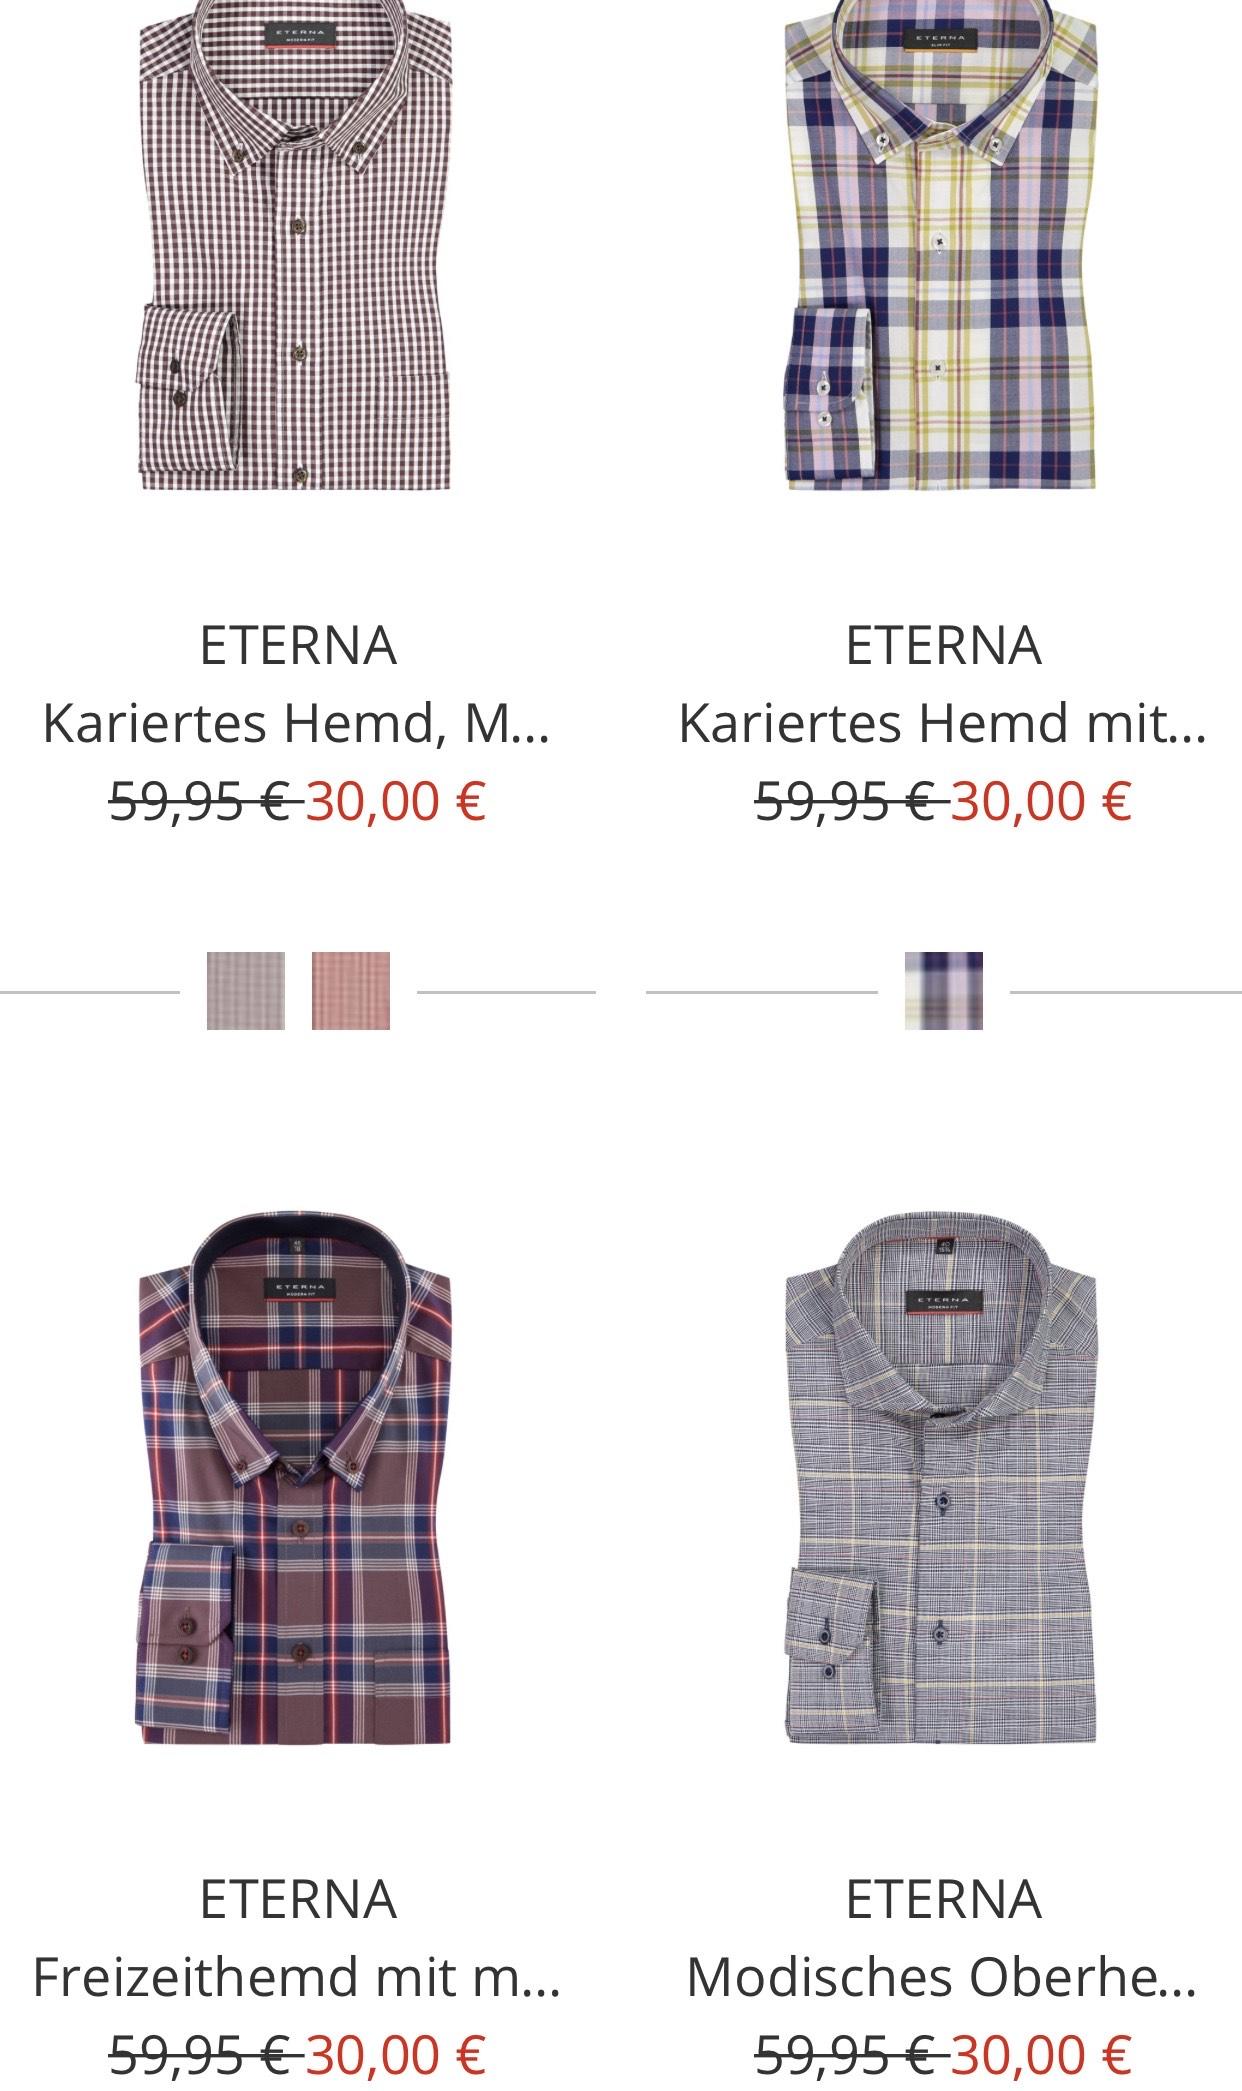 Olymp & Eterna Hemden / Sale bei Hirmer 50%